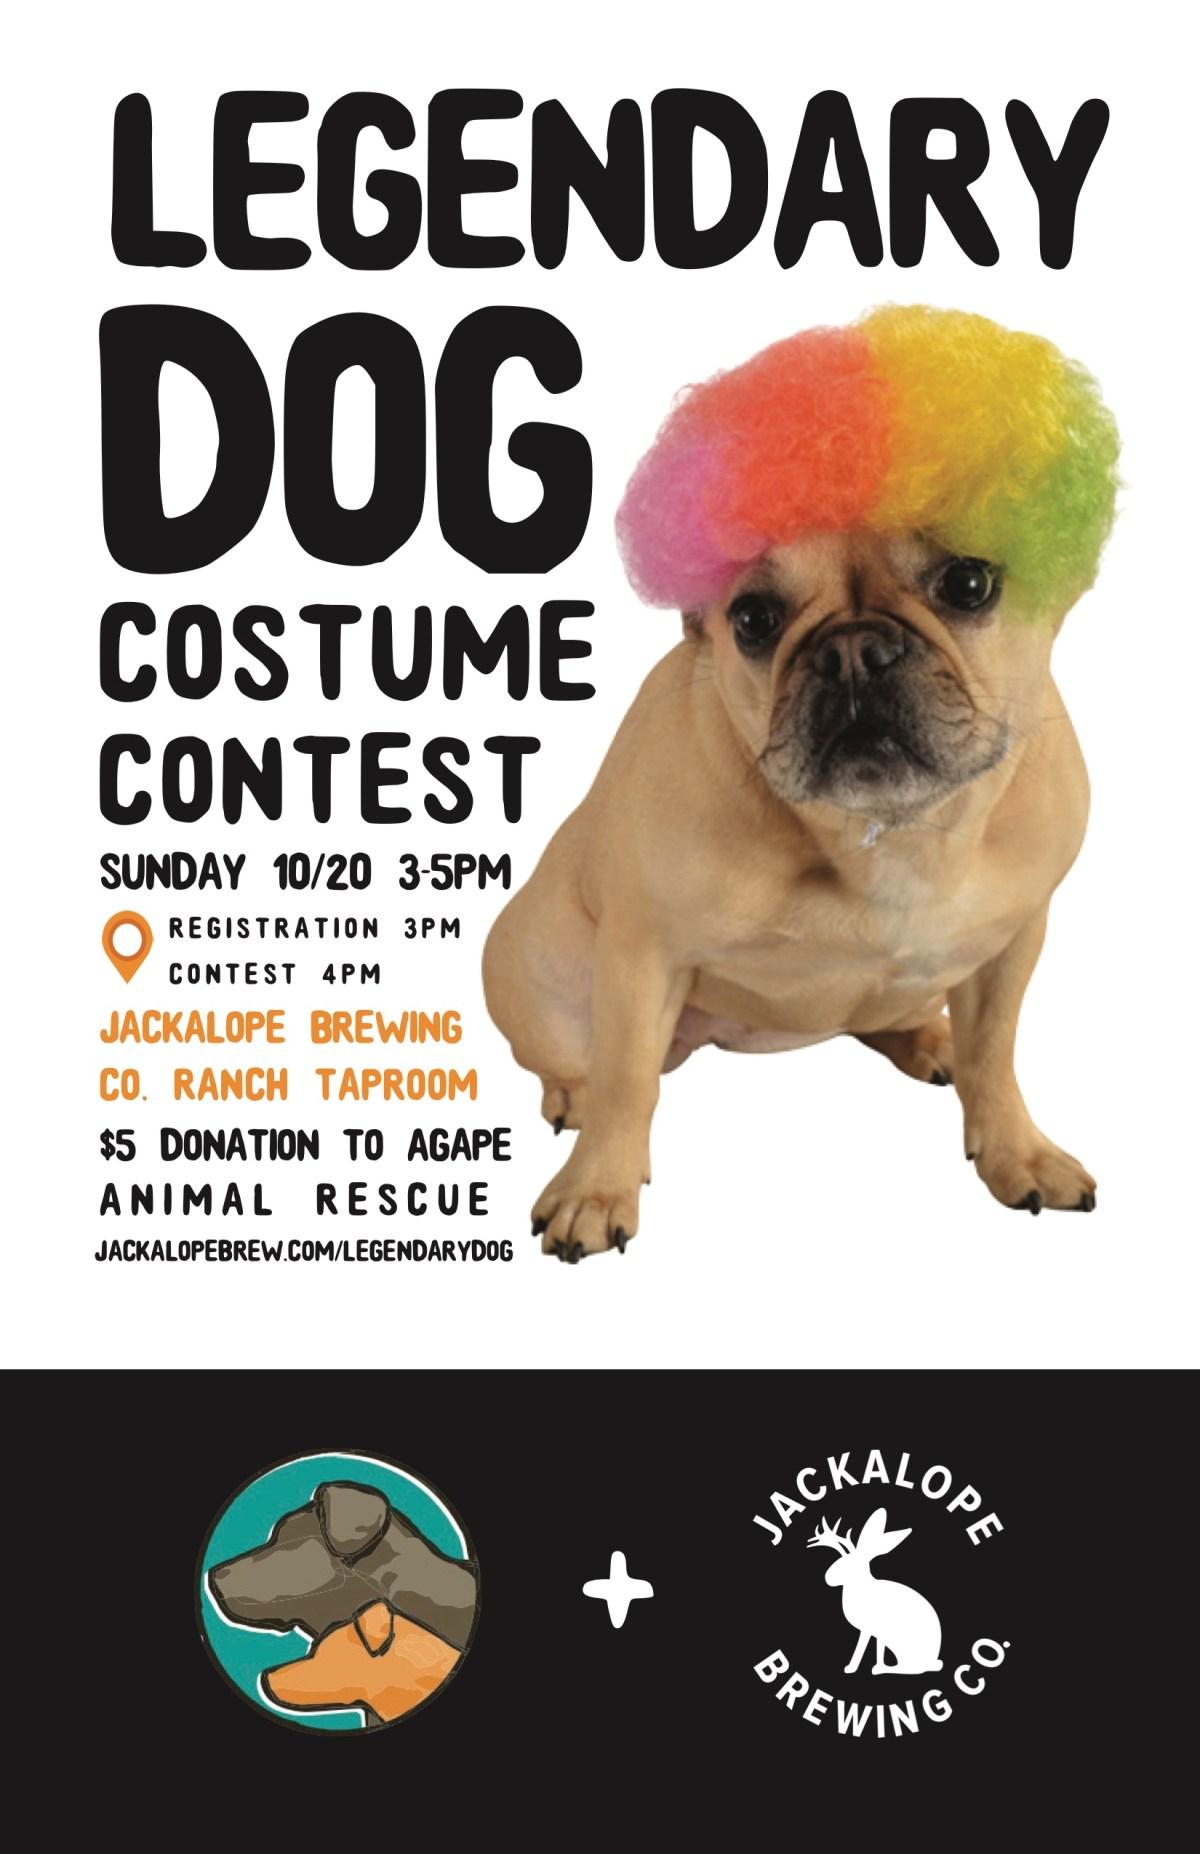 https://i2.wp.com/jackalopebrew.com/wp-content/uploads/2019/09/Legendary-Dog-Costume-Contest.jpg?fit=1200%2C1854&ssl=1